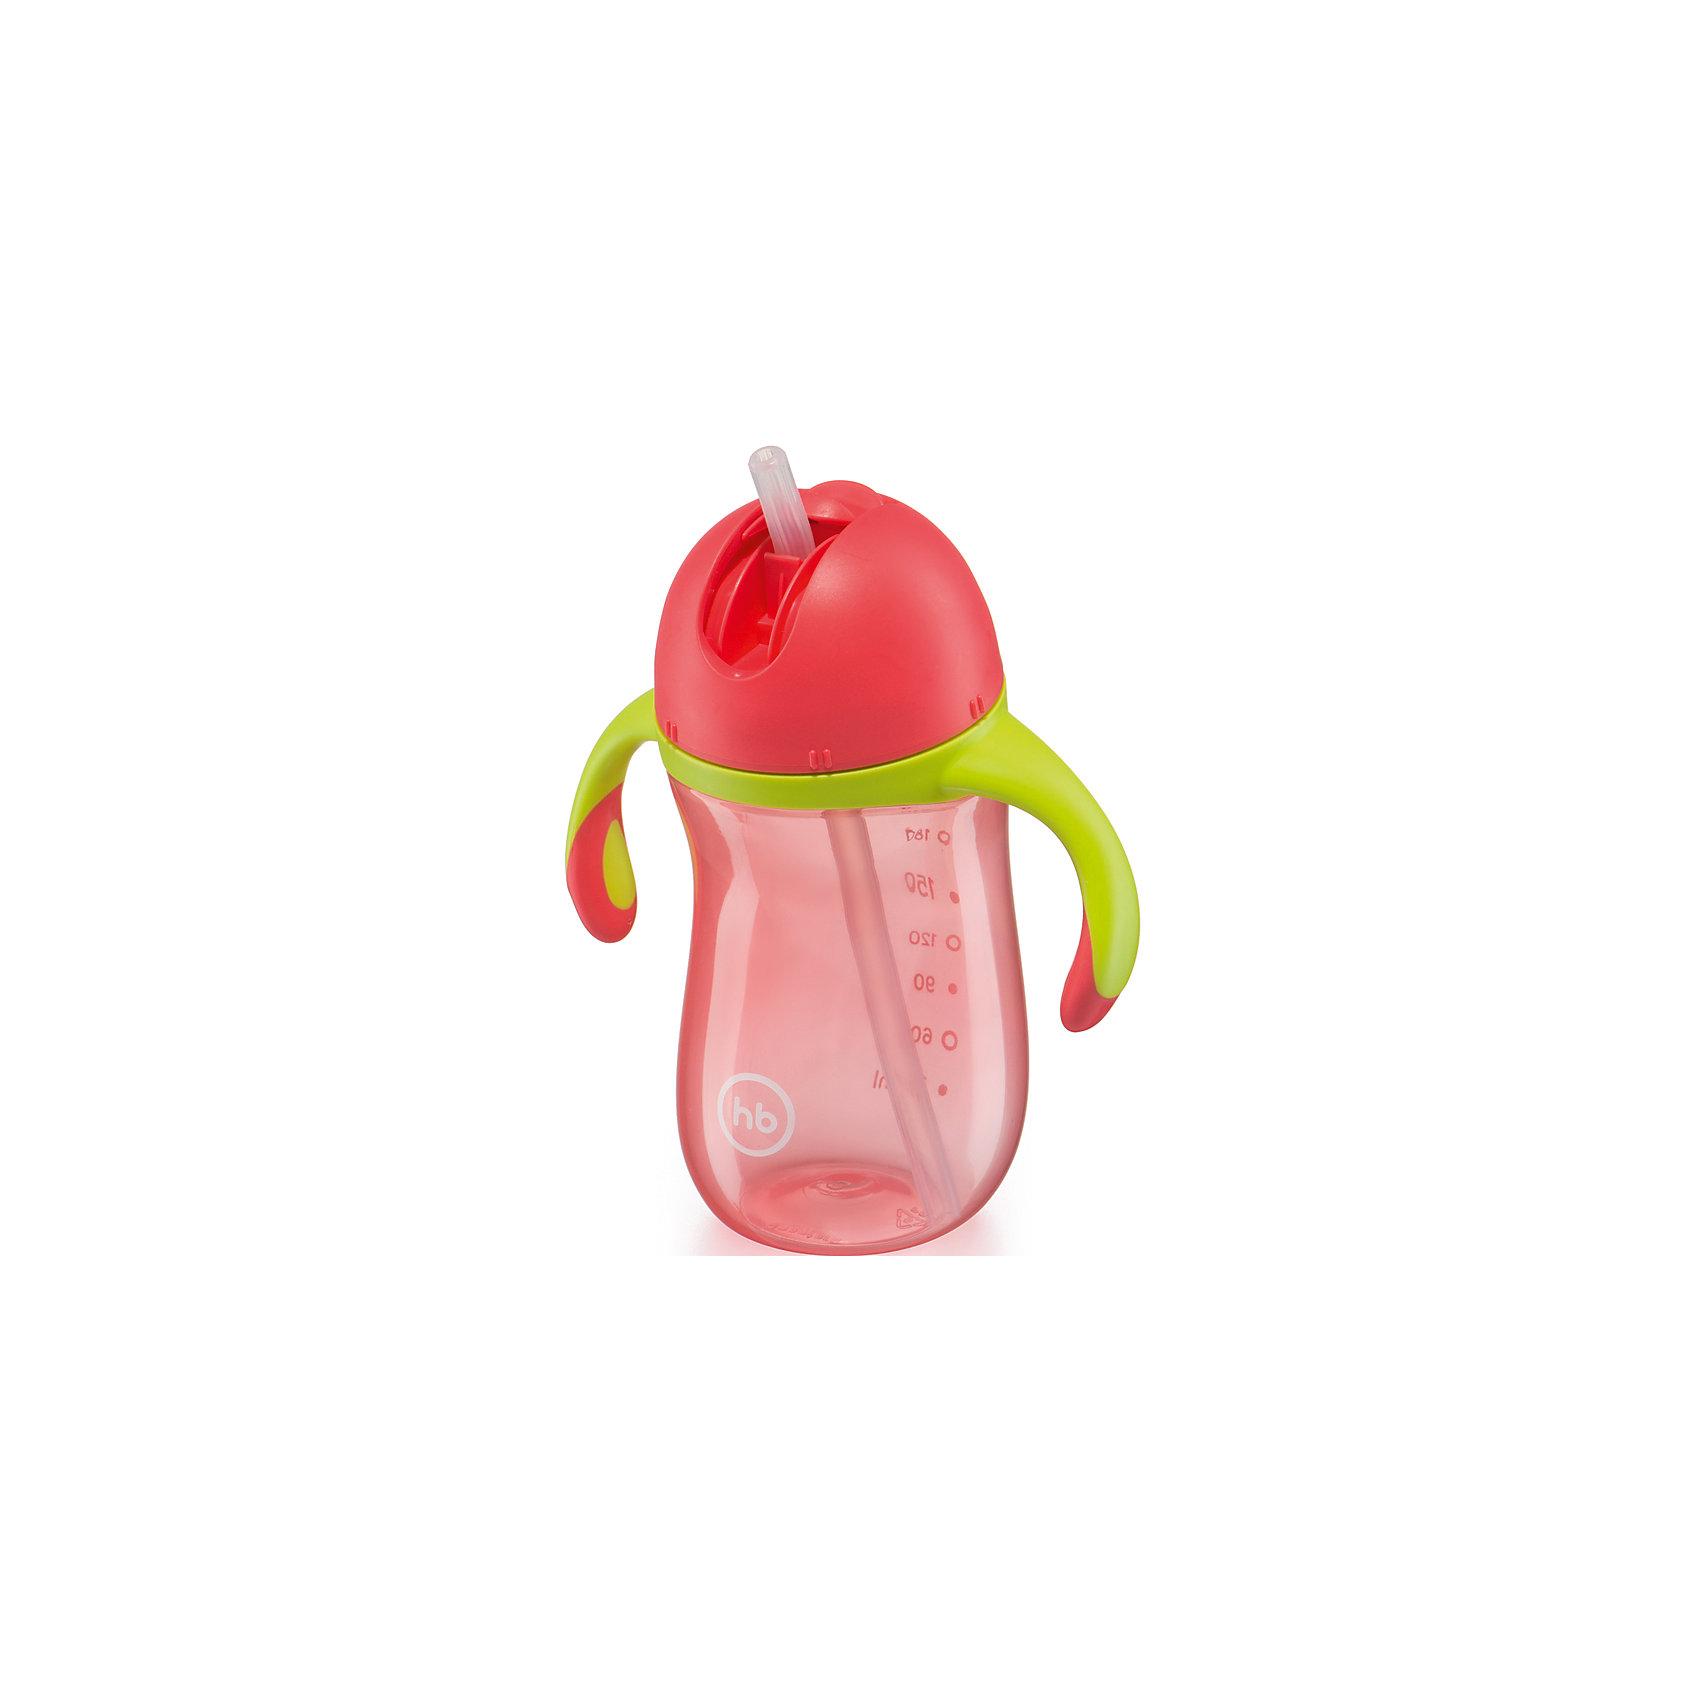 Happy Baby Поильник с трубочкой и ручками STAR FEEDING CUP, Happy Baby, зеленый happy baby поильник с ручками с 6 мес